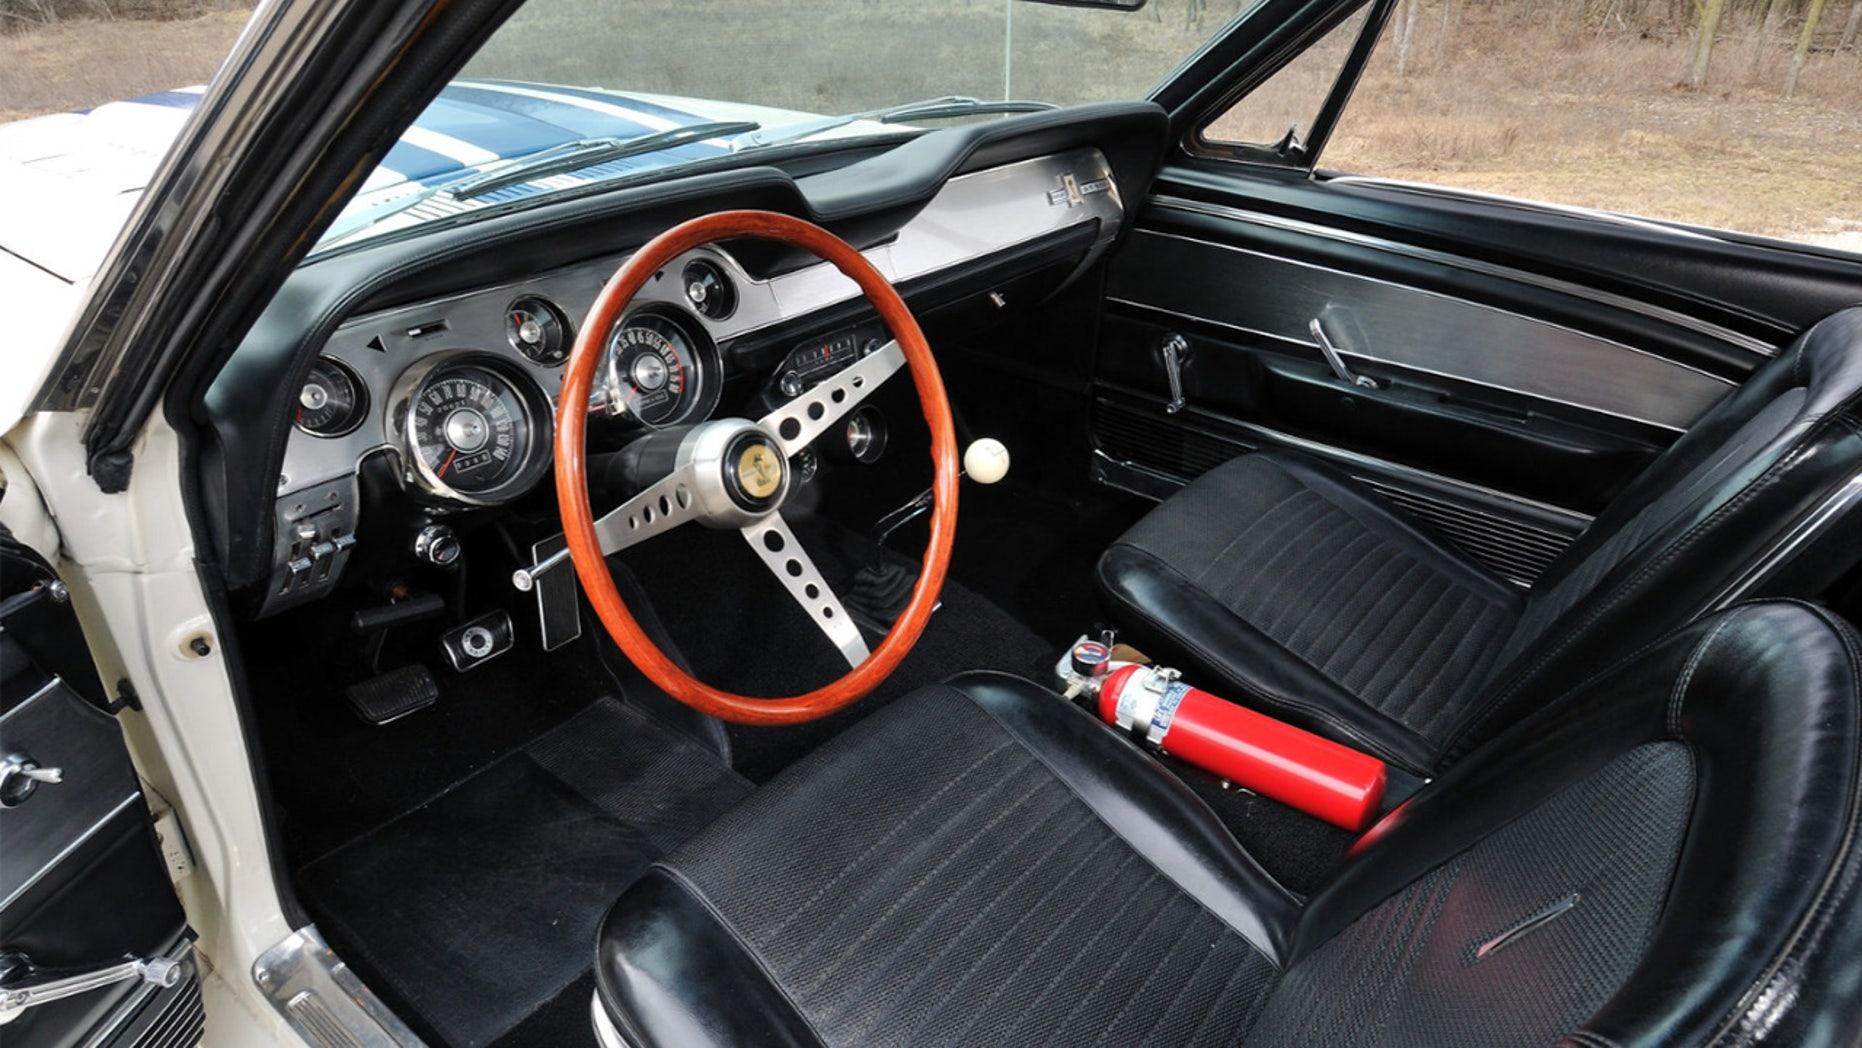 1967 Shelby GT500 Super Snake Interior